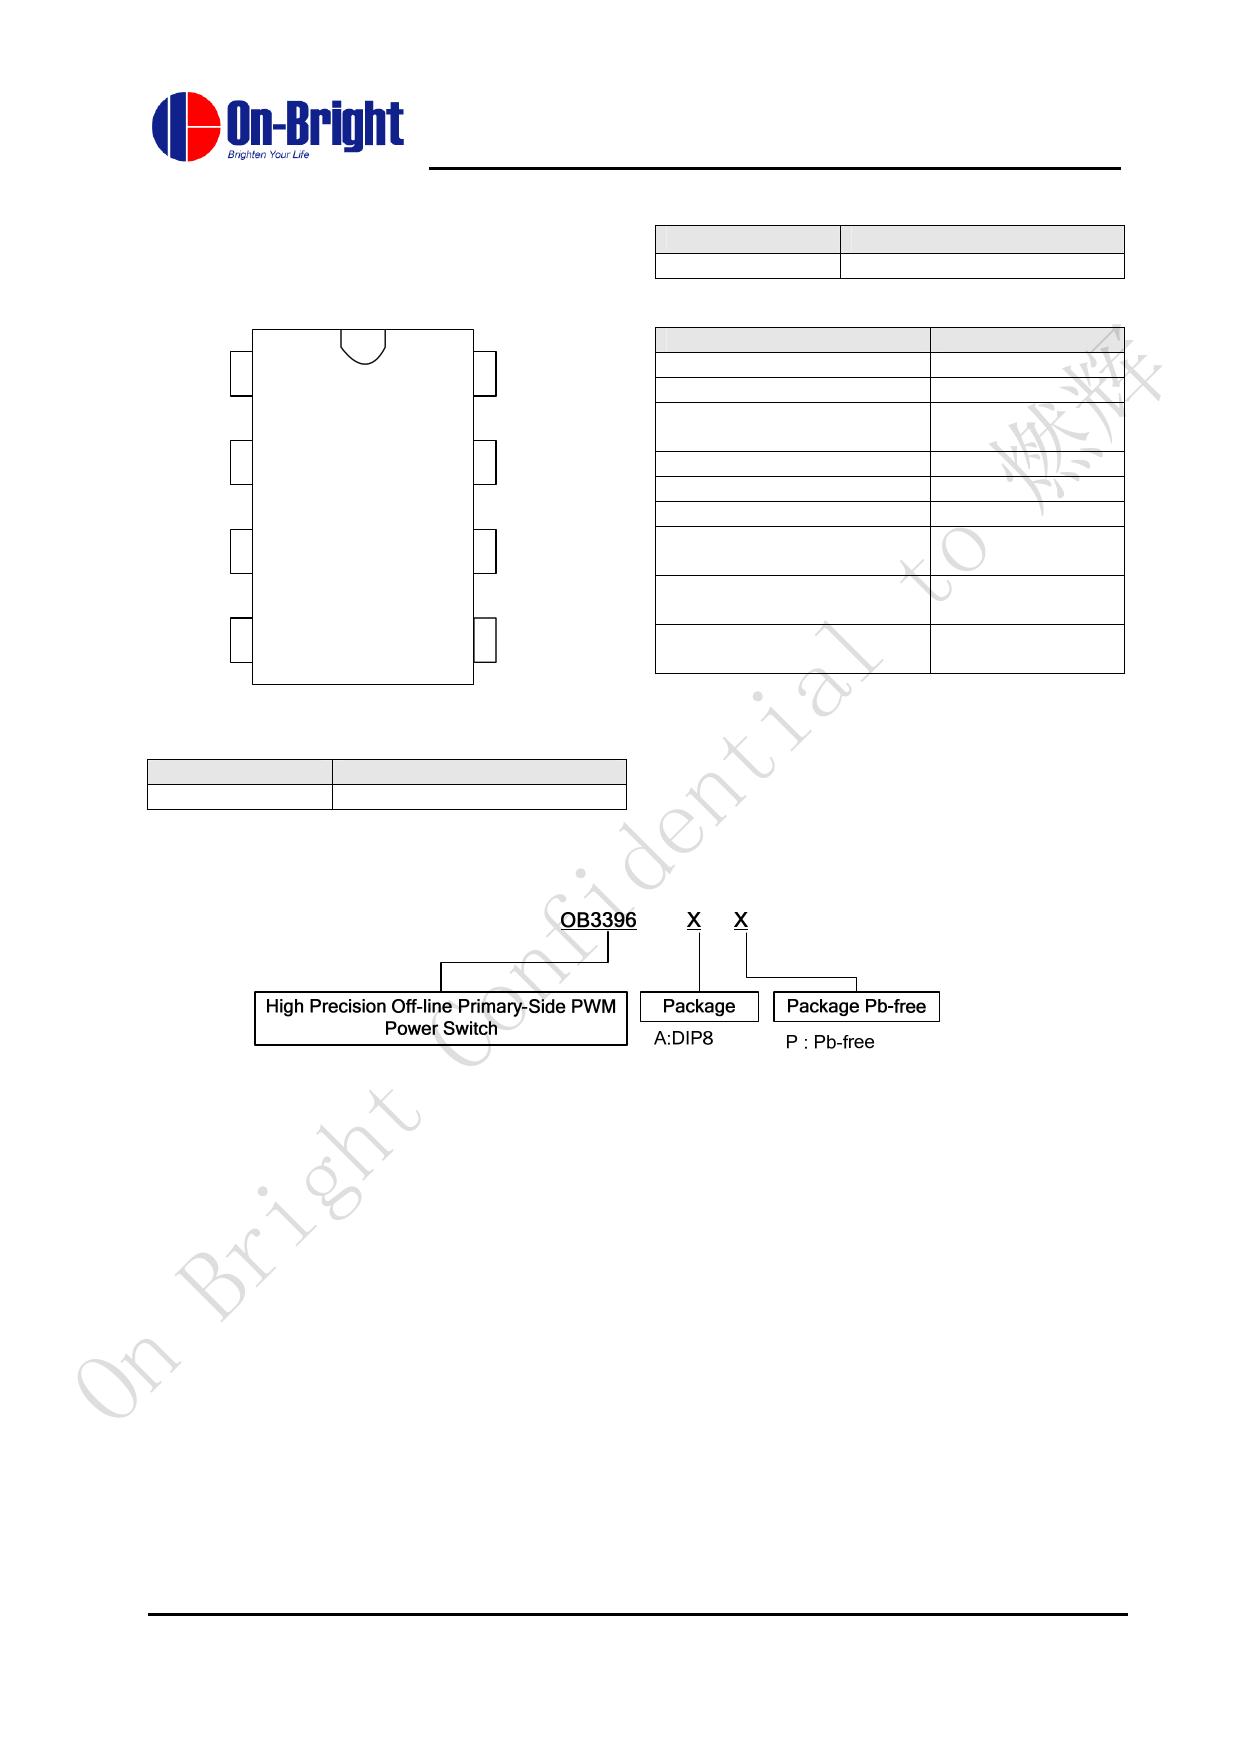 OB3396AP pdf, schematic